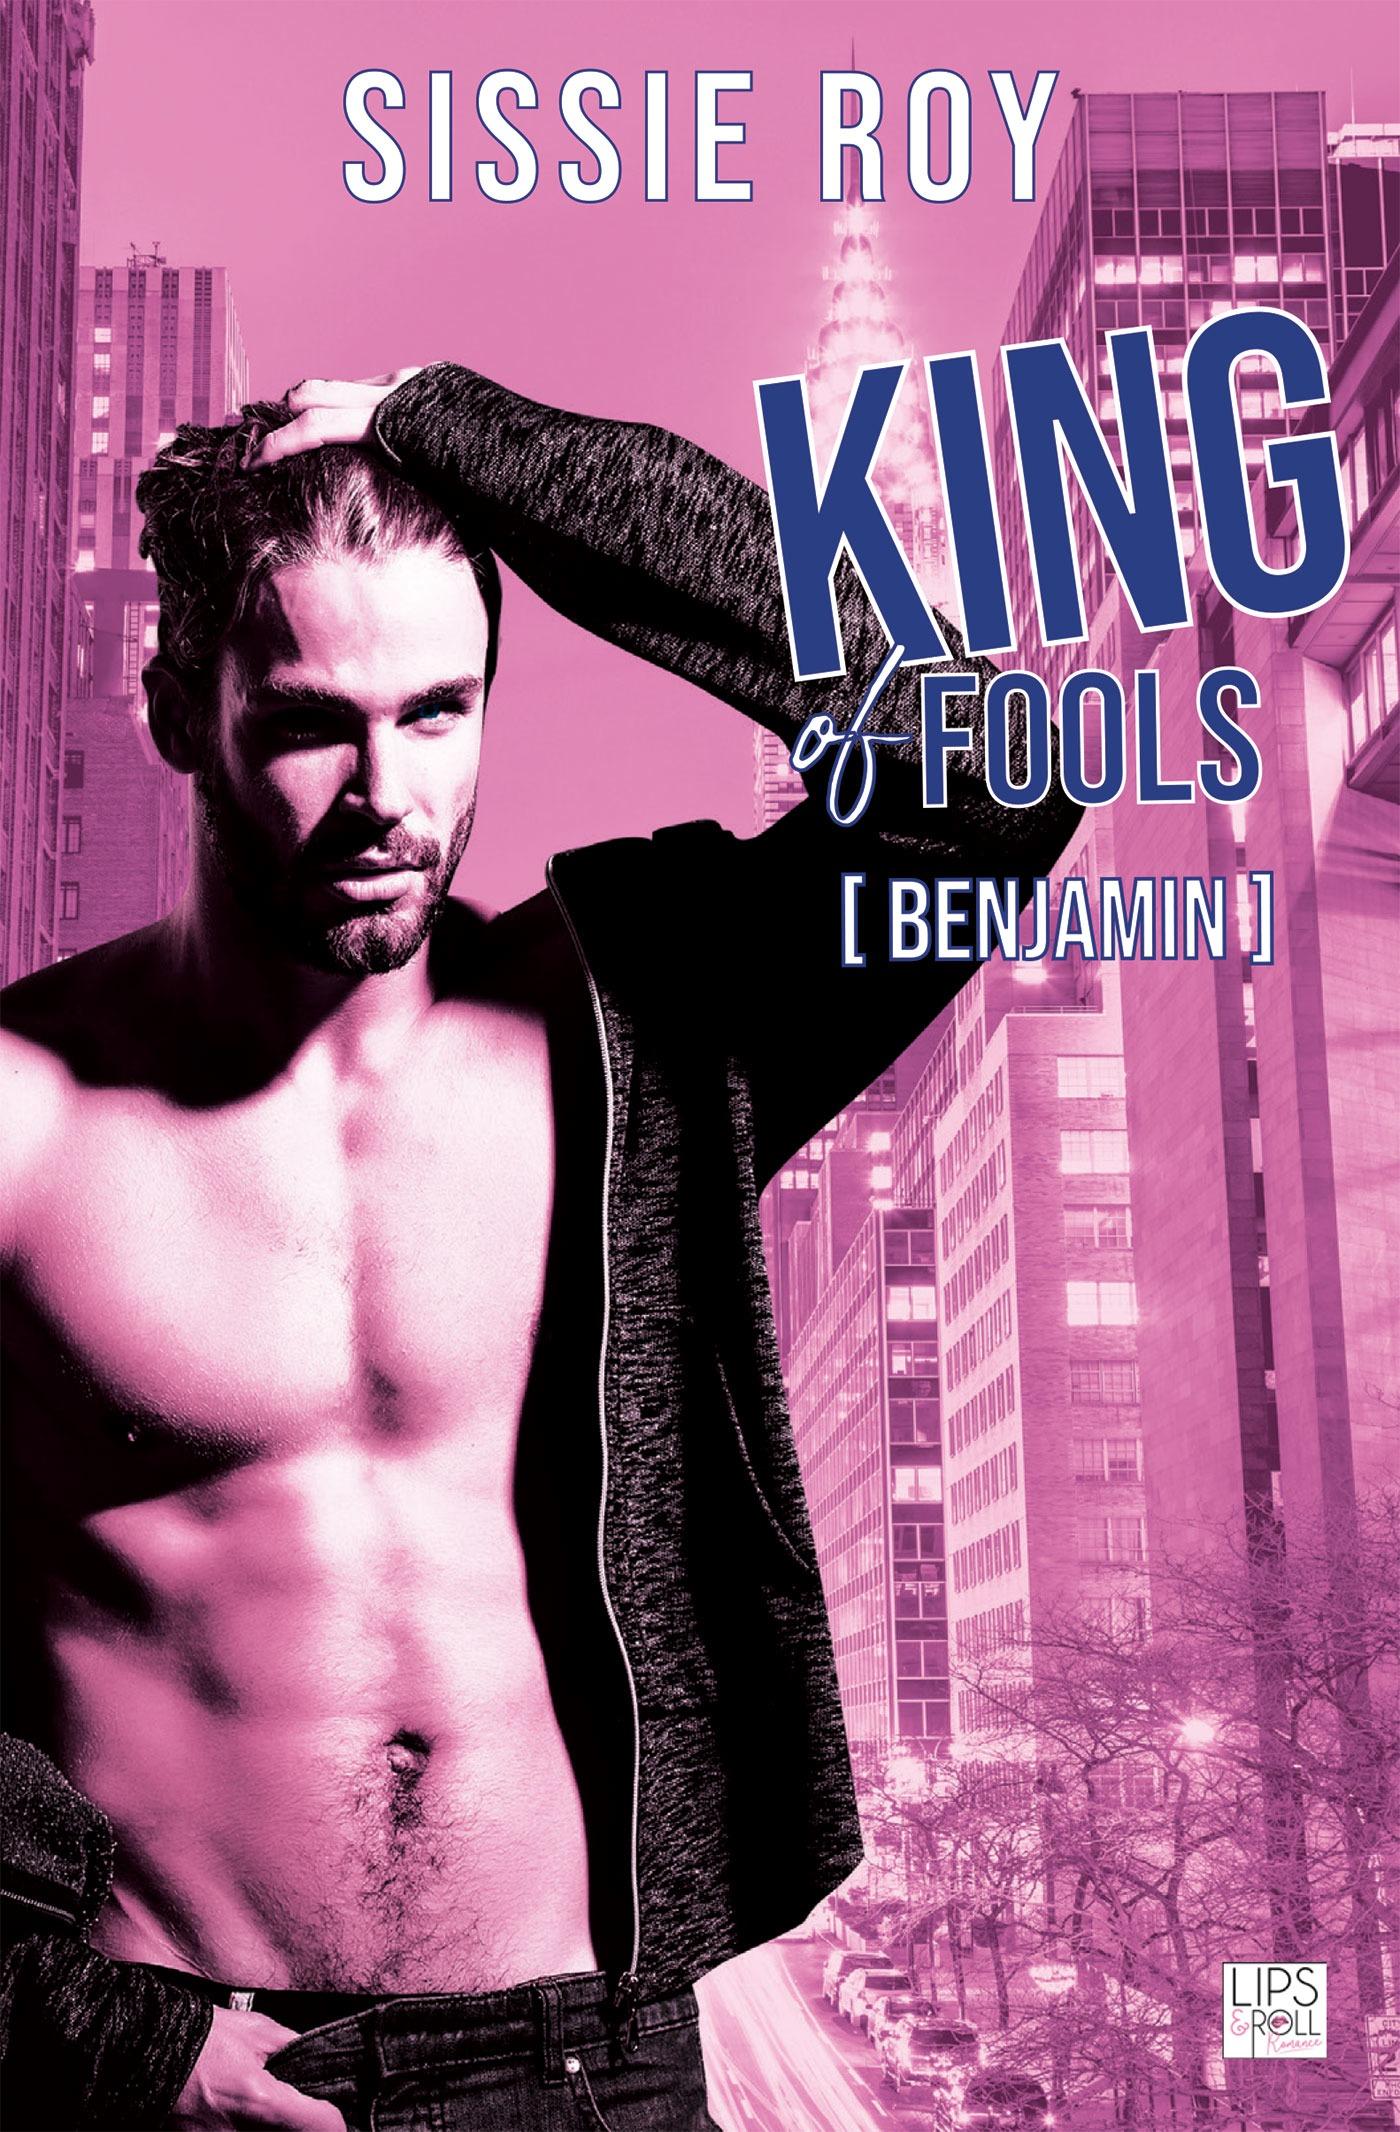 King of fools - Benjamin